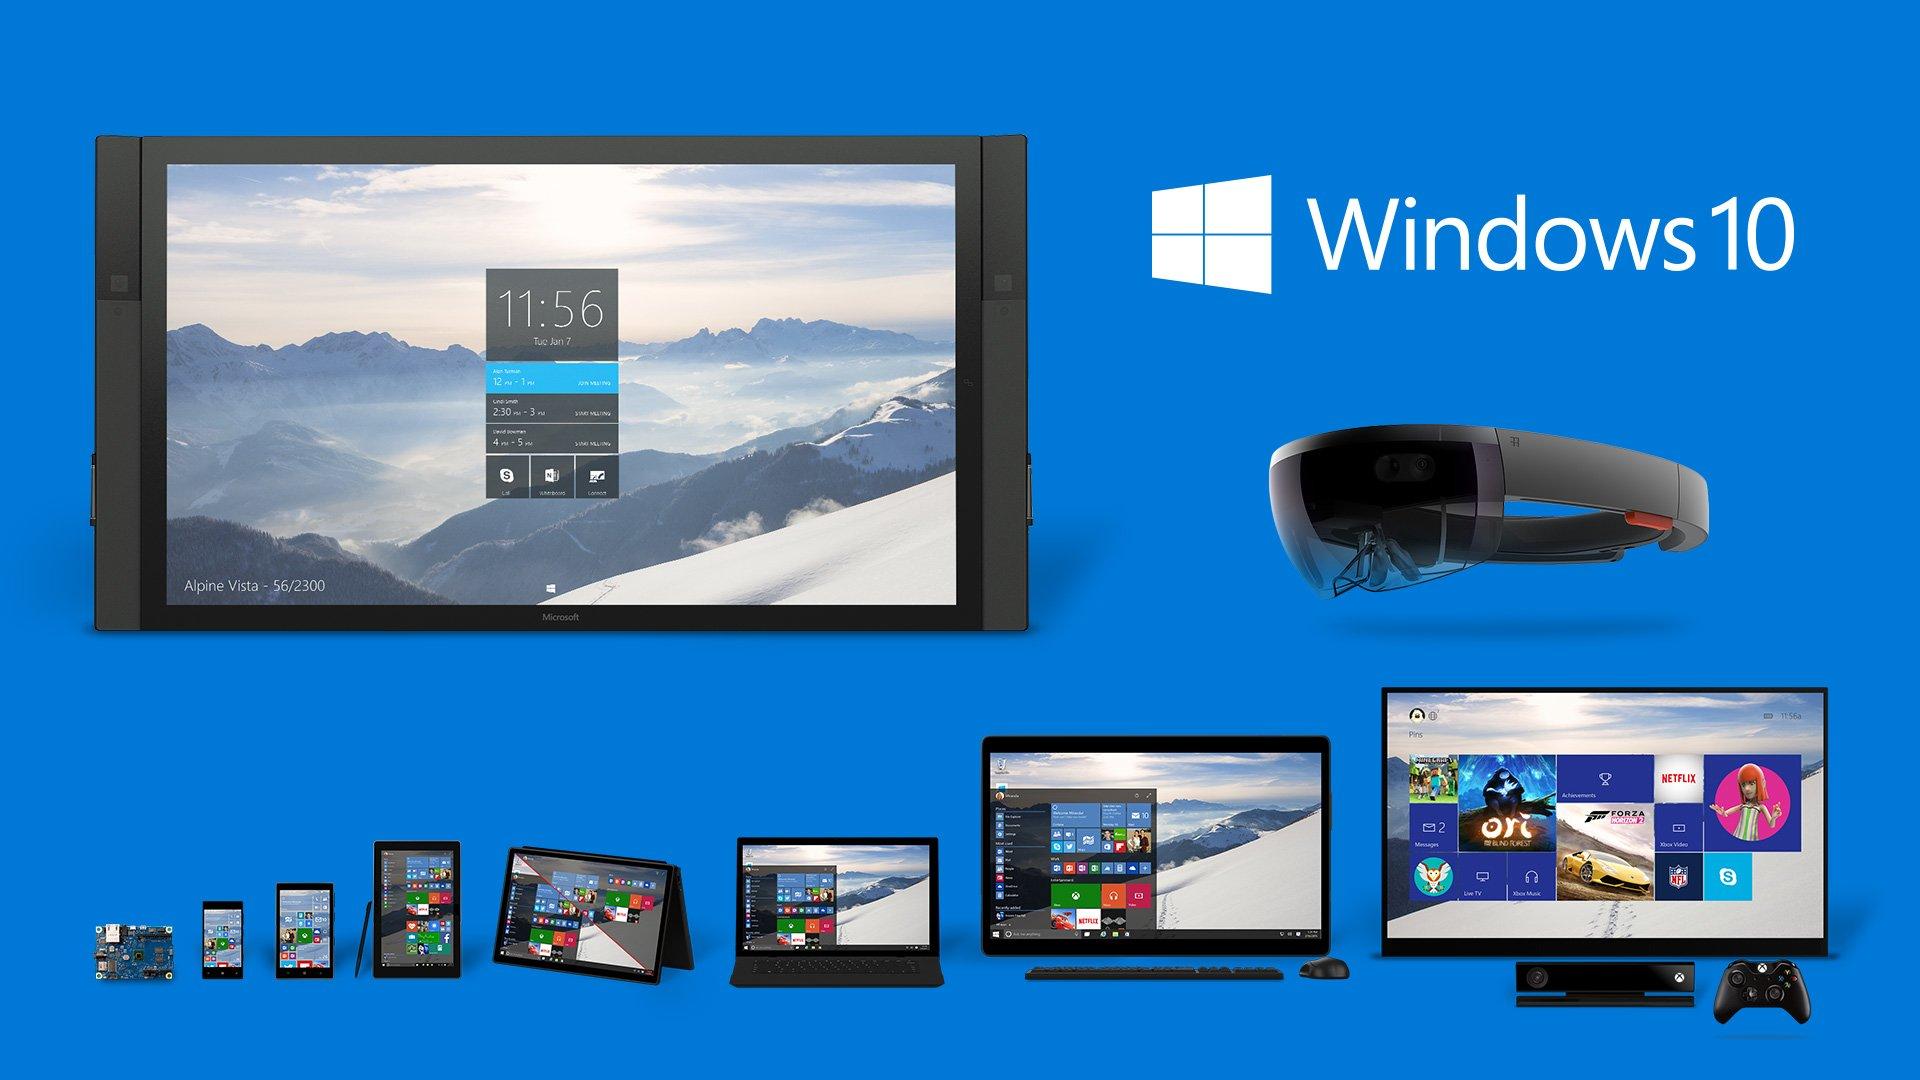 Windows 10 – The Consumer Update